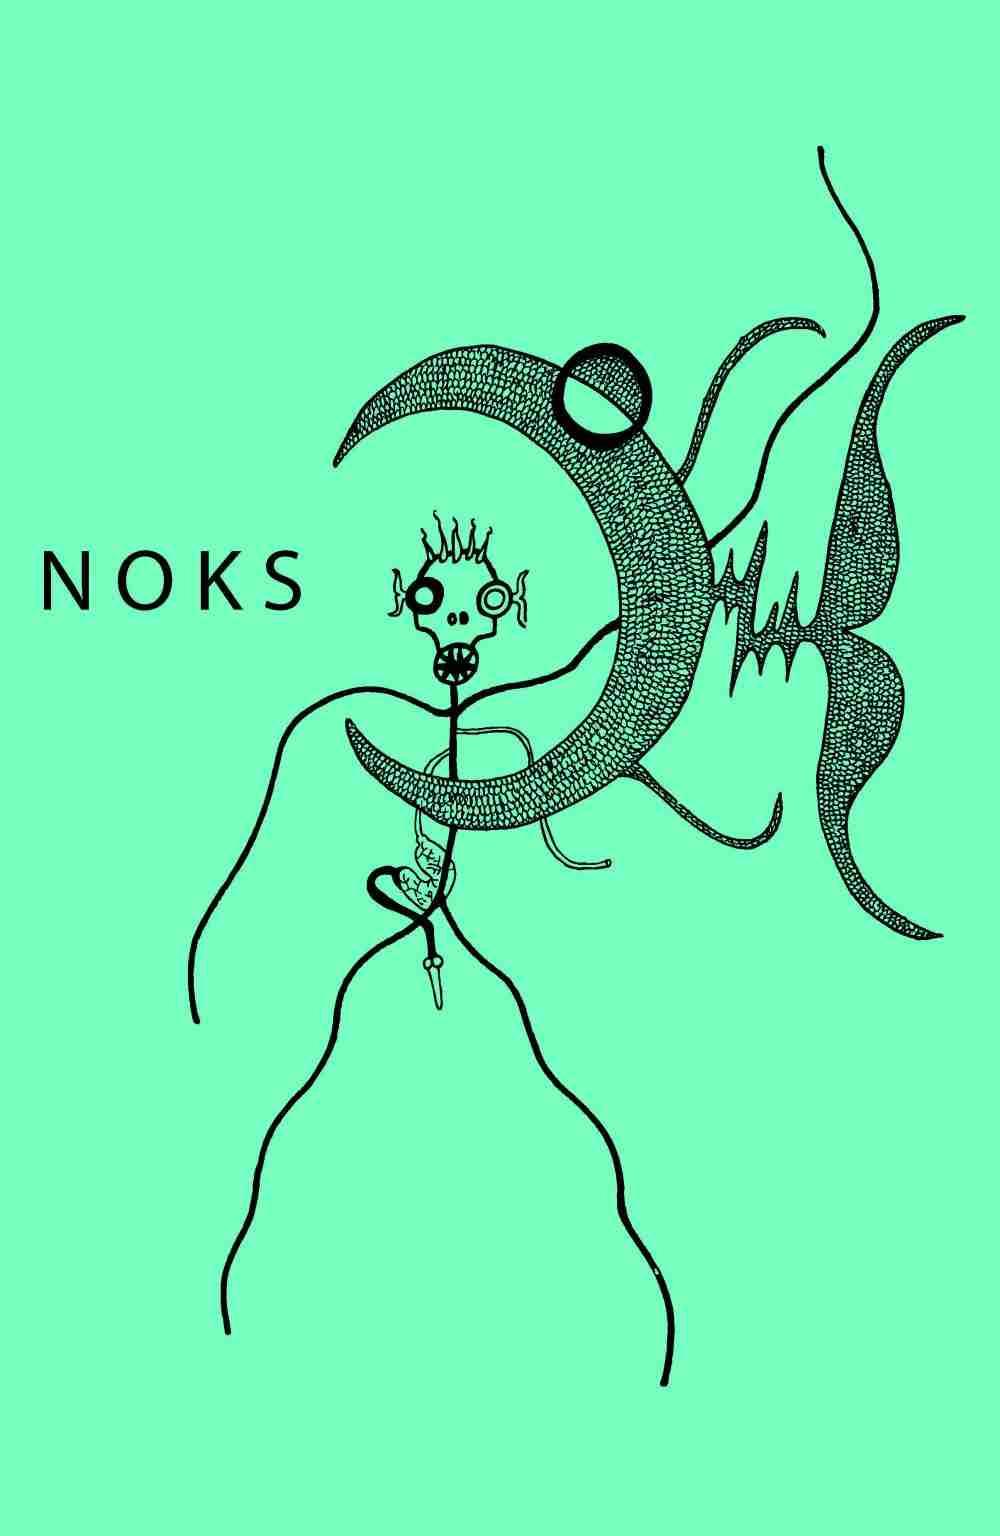 Feral Instinct poster by NOKS